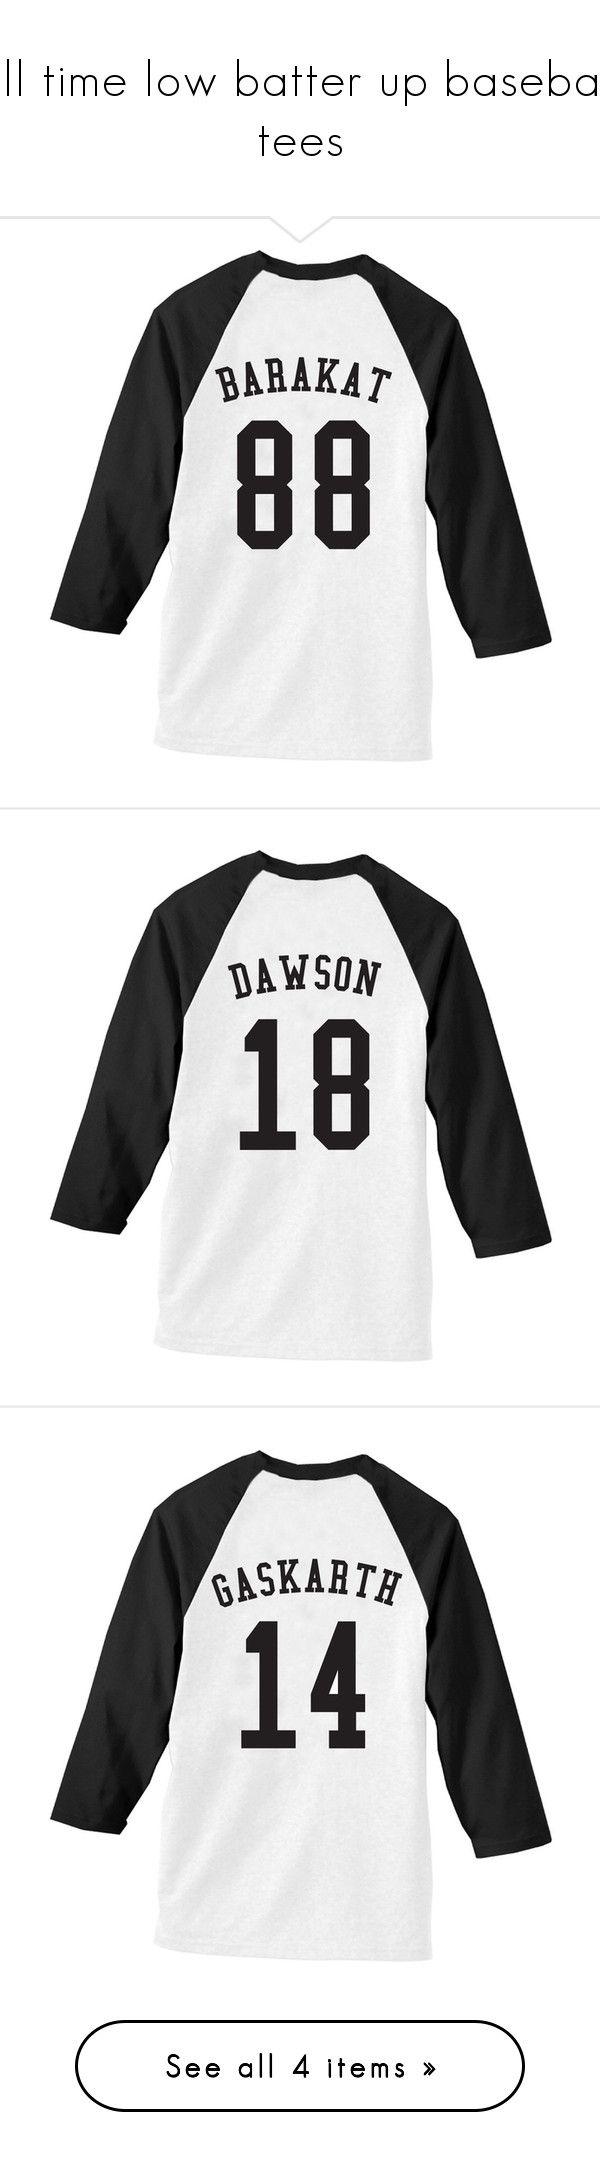 Harga Tendencies Tshirt Born To Fire Hitam M Terbaru 2018 Tnd Hipster Putih Xl 907 Best General Images On Pinterest Concert T Shirts